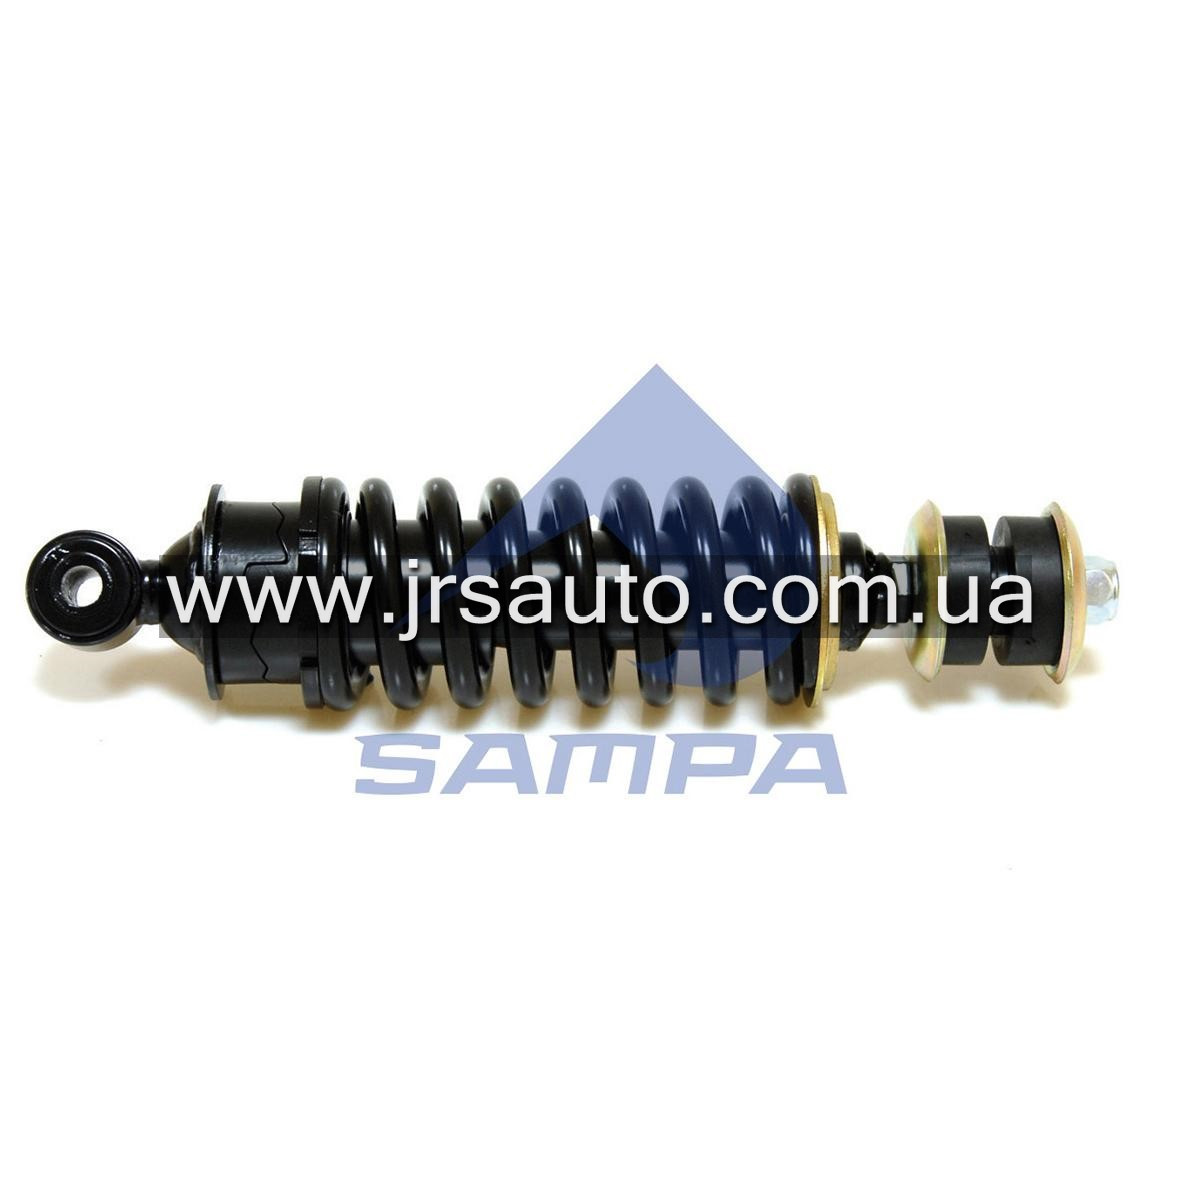 Амортизатор кабины DAF 95XF,XF95,105 (L238-276) задний \1623465 \ 050.204